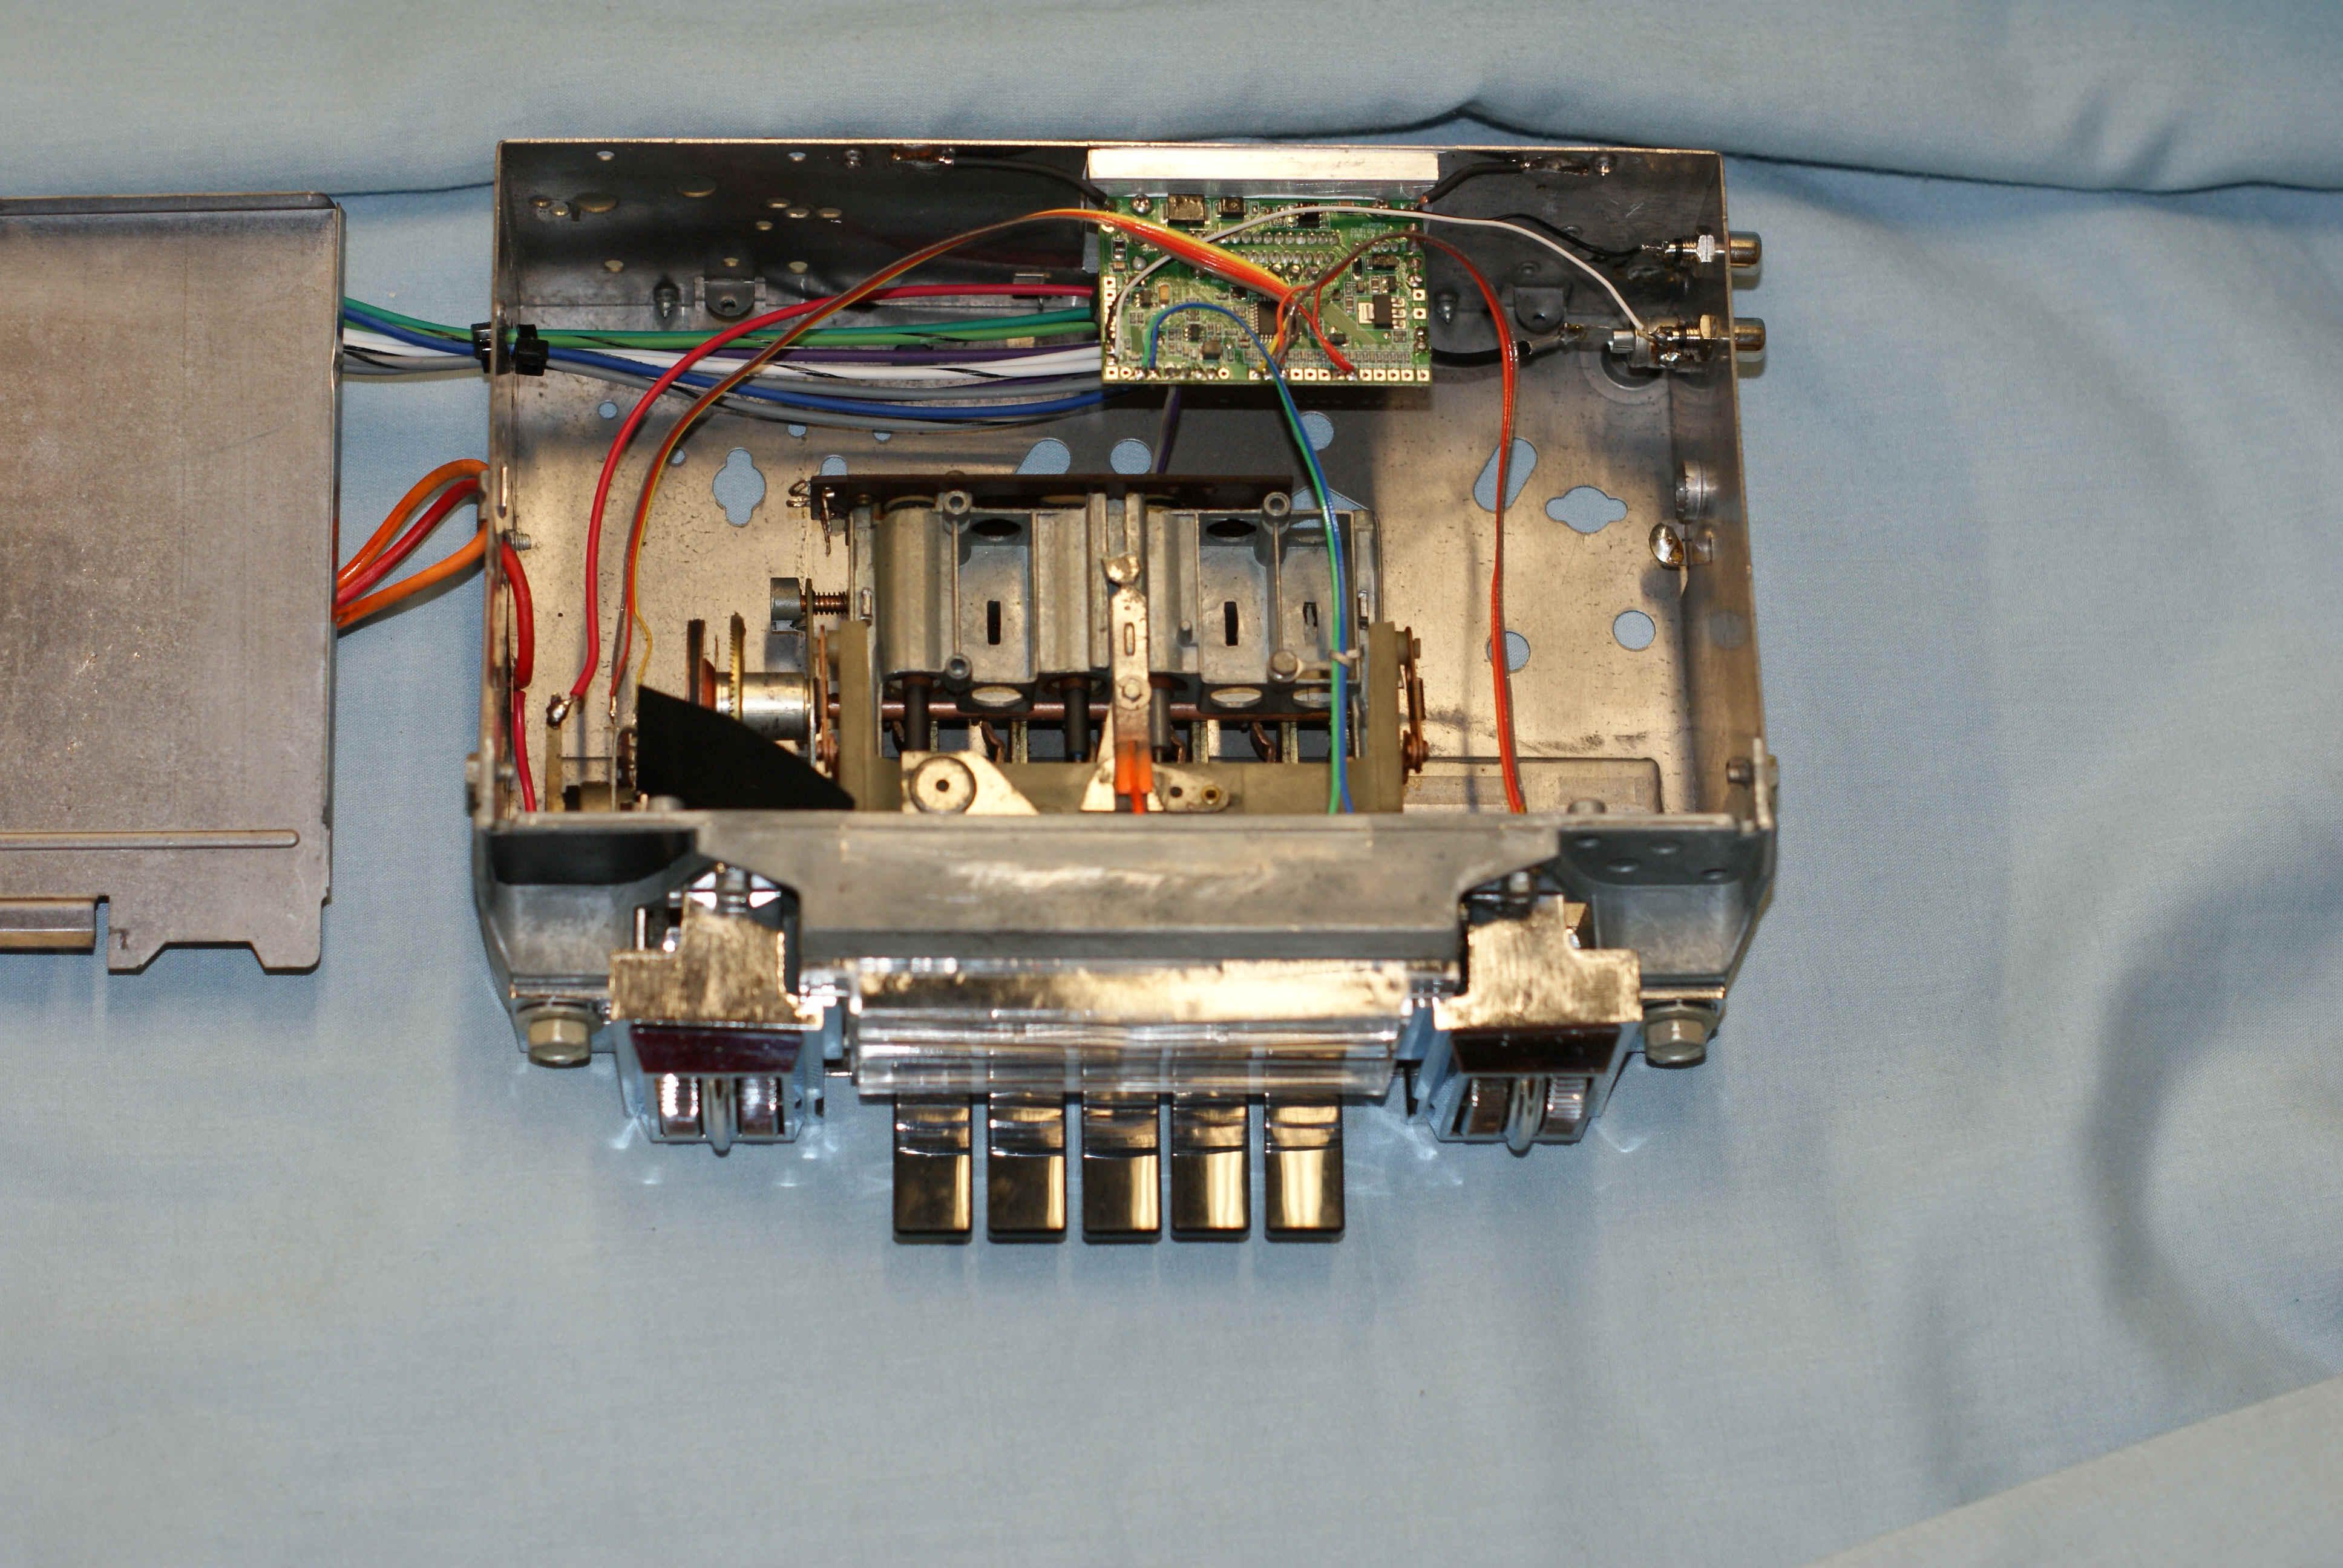 Electro Tech Service 1 1934 Chrysler Positive Ground Wiring Diagram Dsc03536 3962686 Bytes